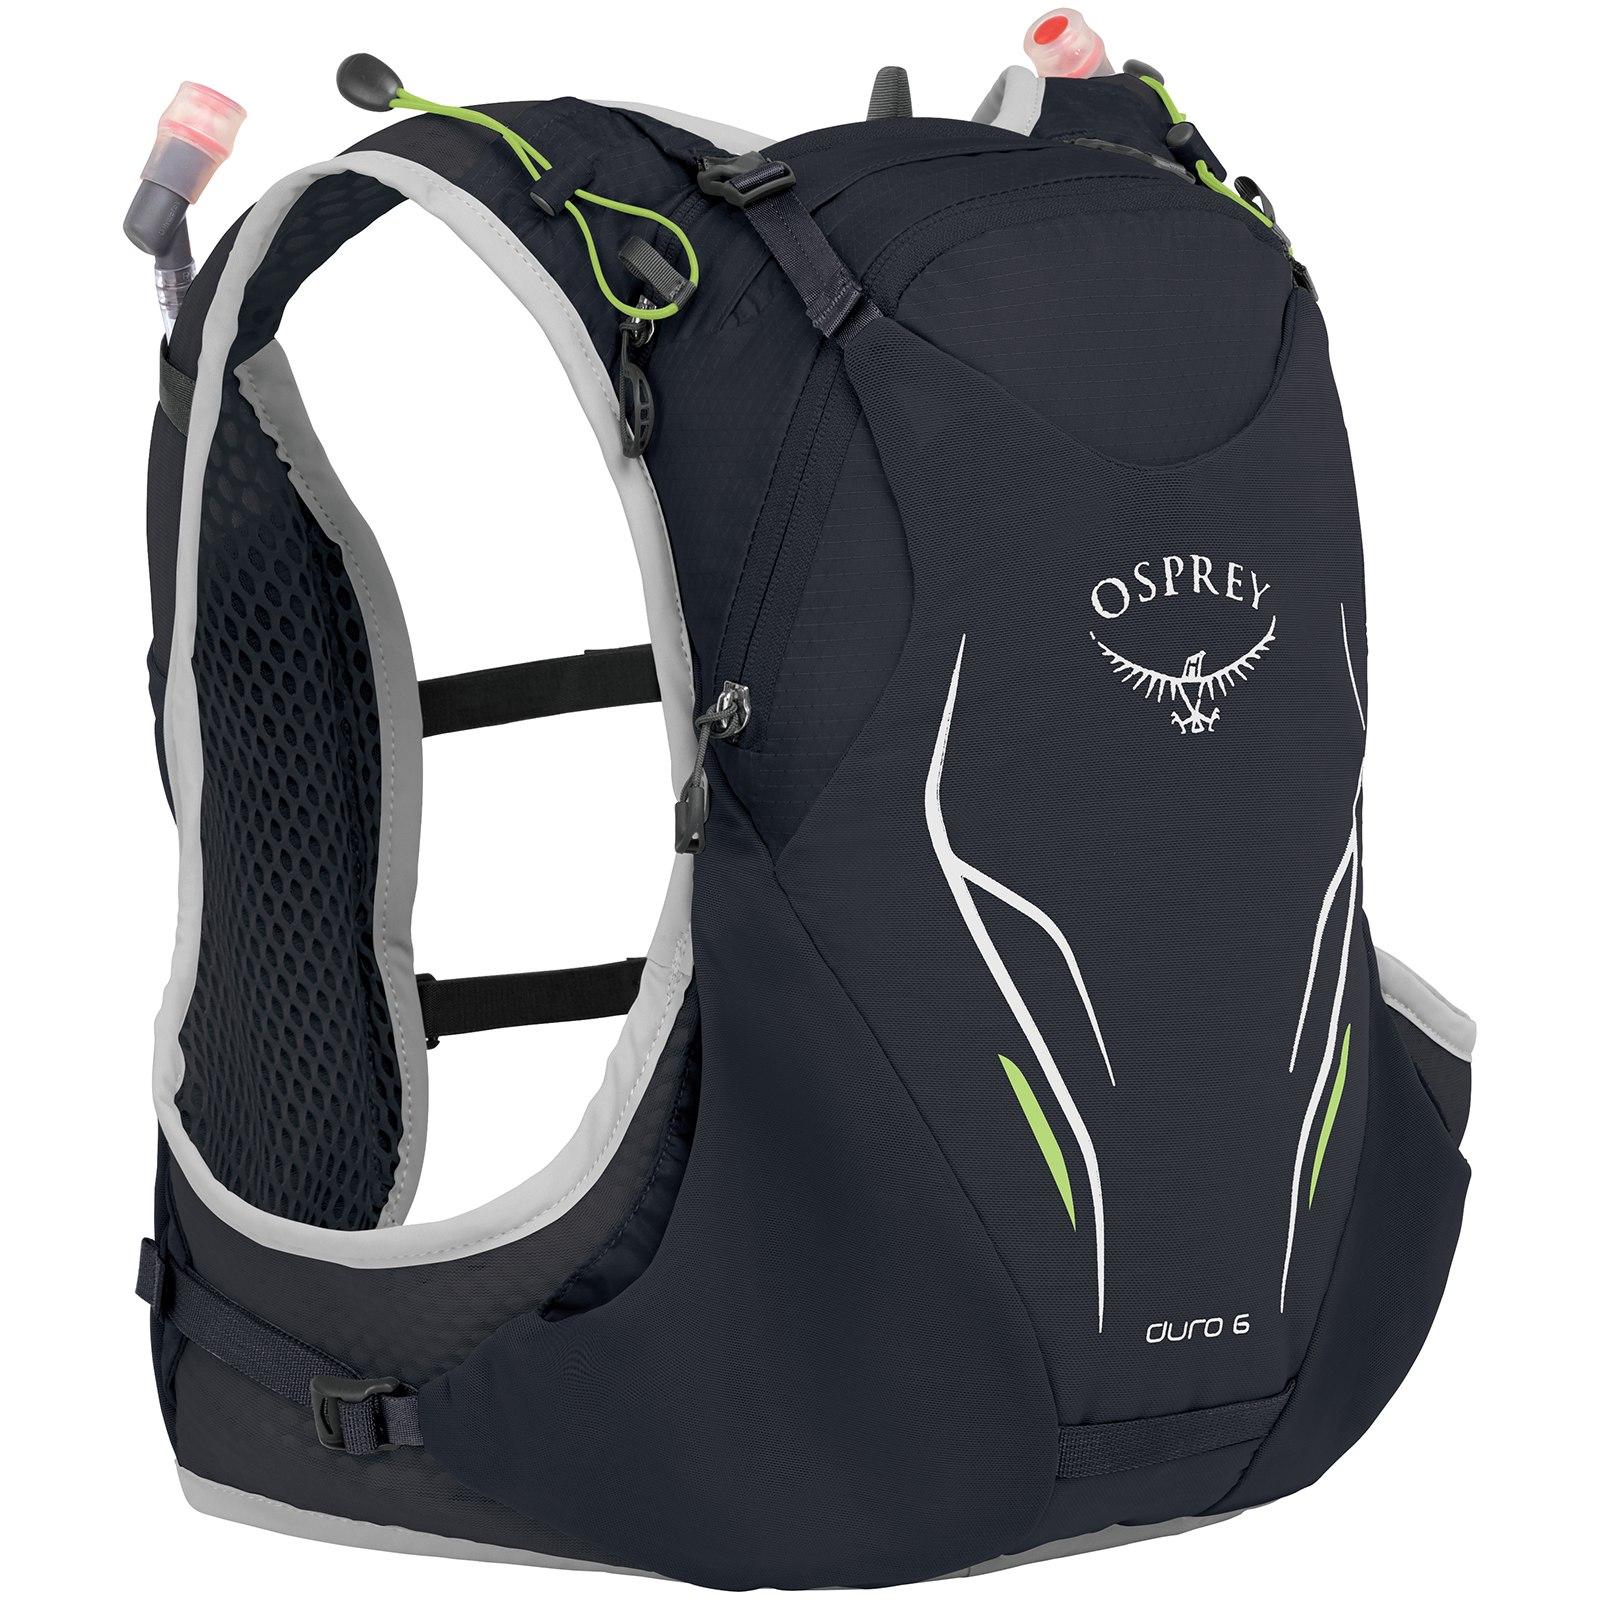 Image of Osprey Duro 6 Running Backpack - Alpine Black